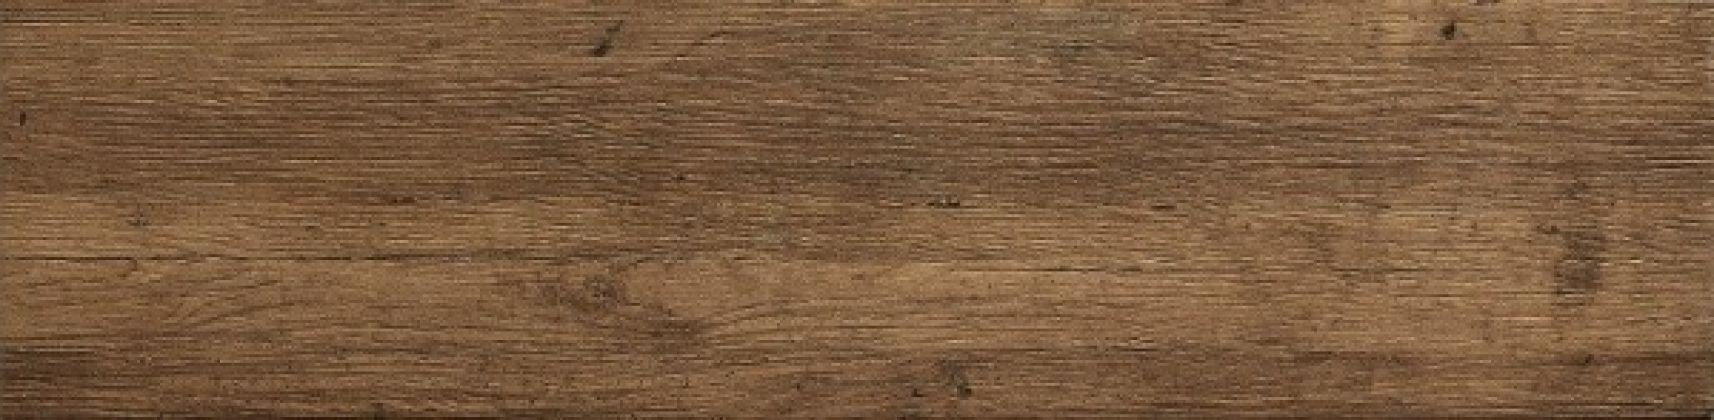 Meranti Roble (1,368) 20,5x61,5